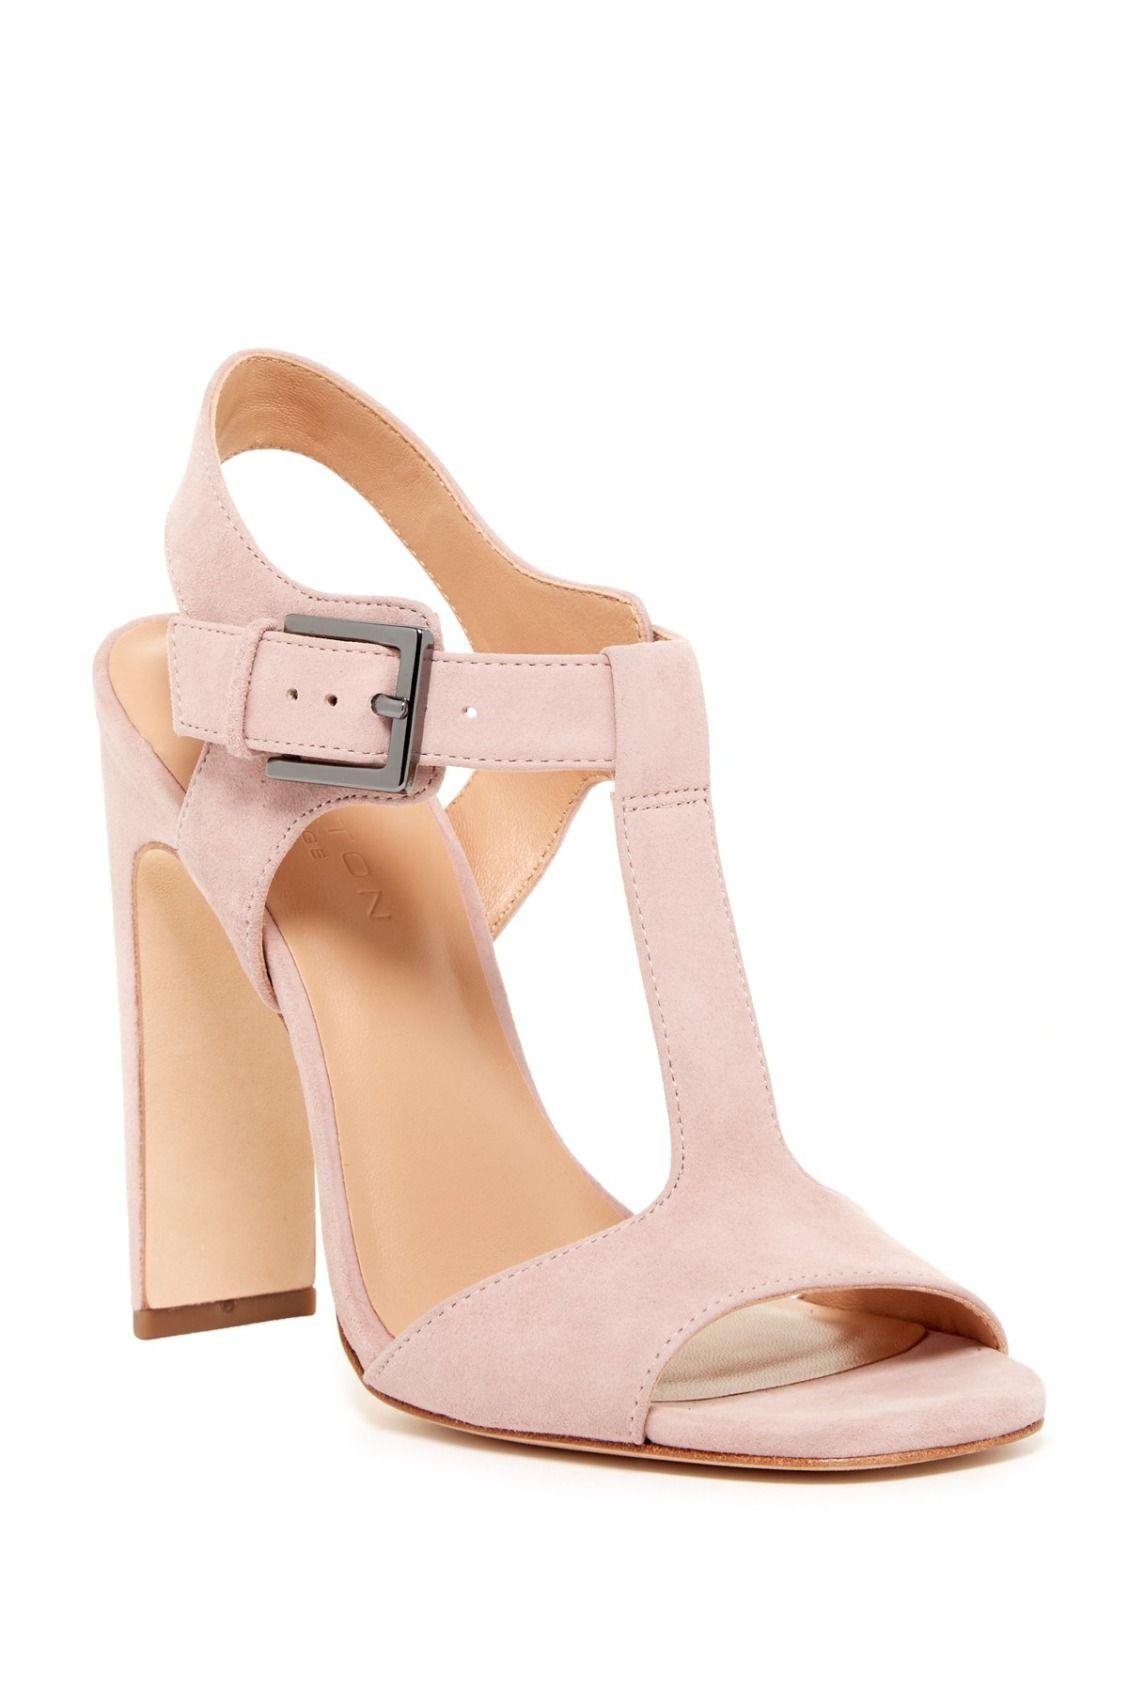 573a826b755 Blush Halston Heritage Vera T-Strap Heel Sandals   Shoes for Days ...